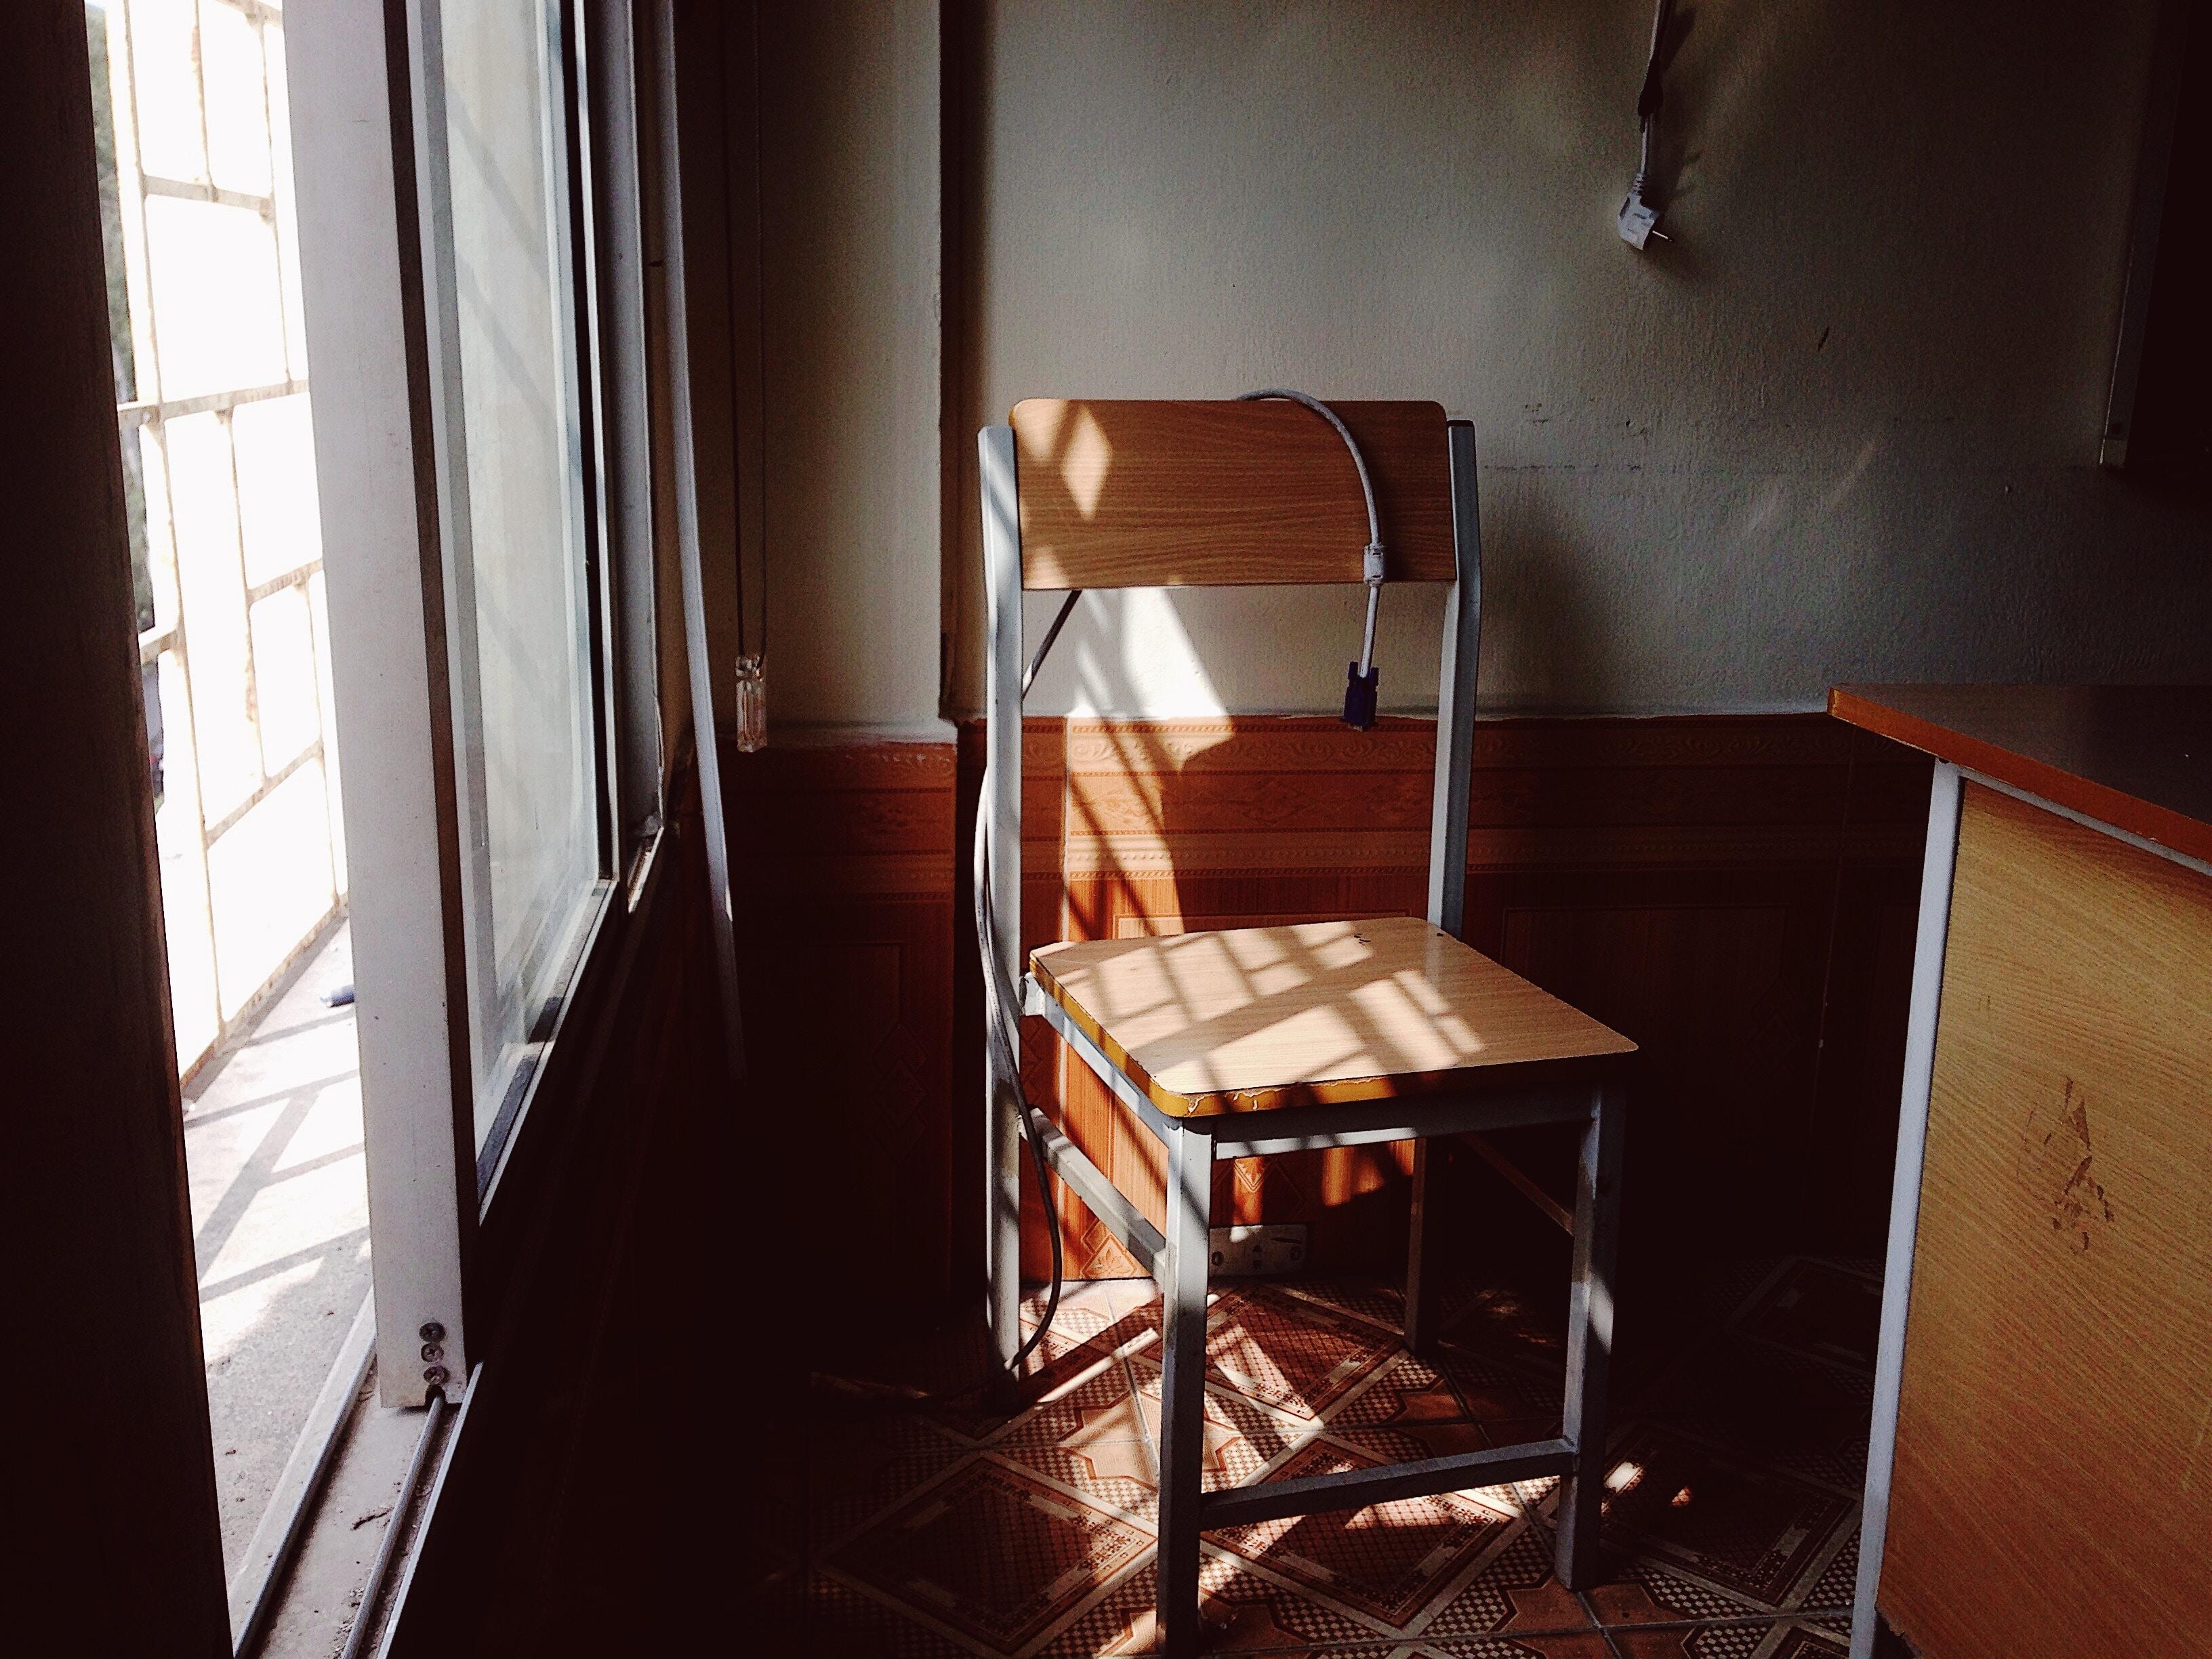 gray and brown chair near window